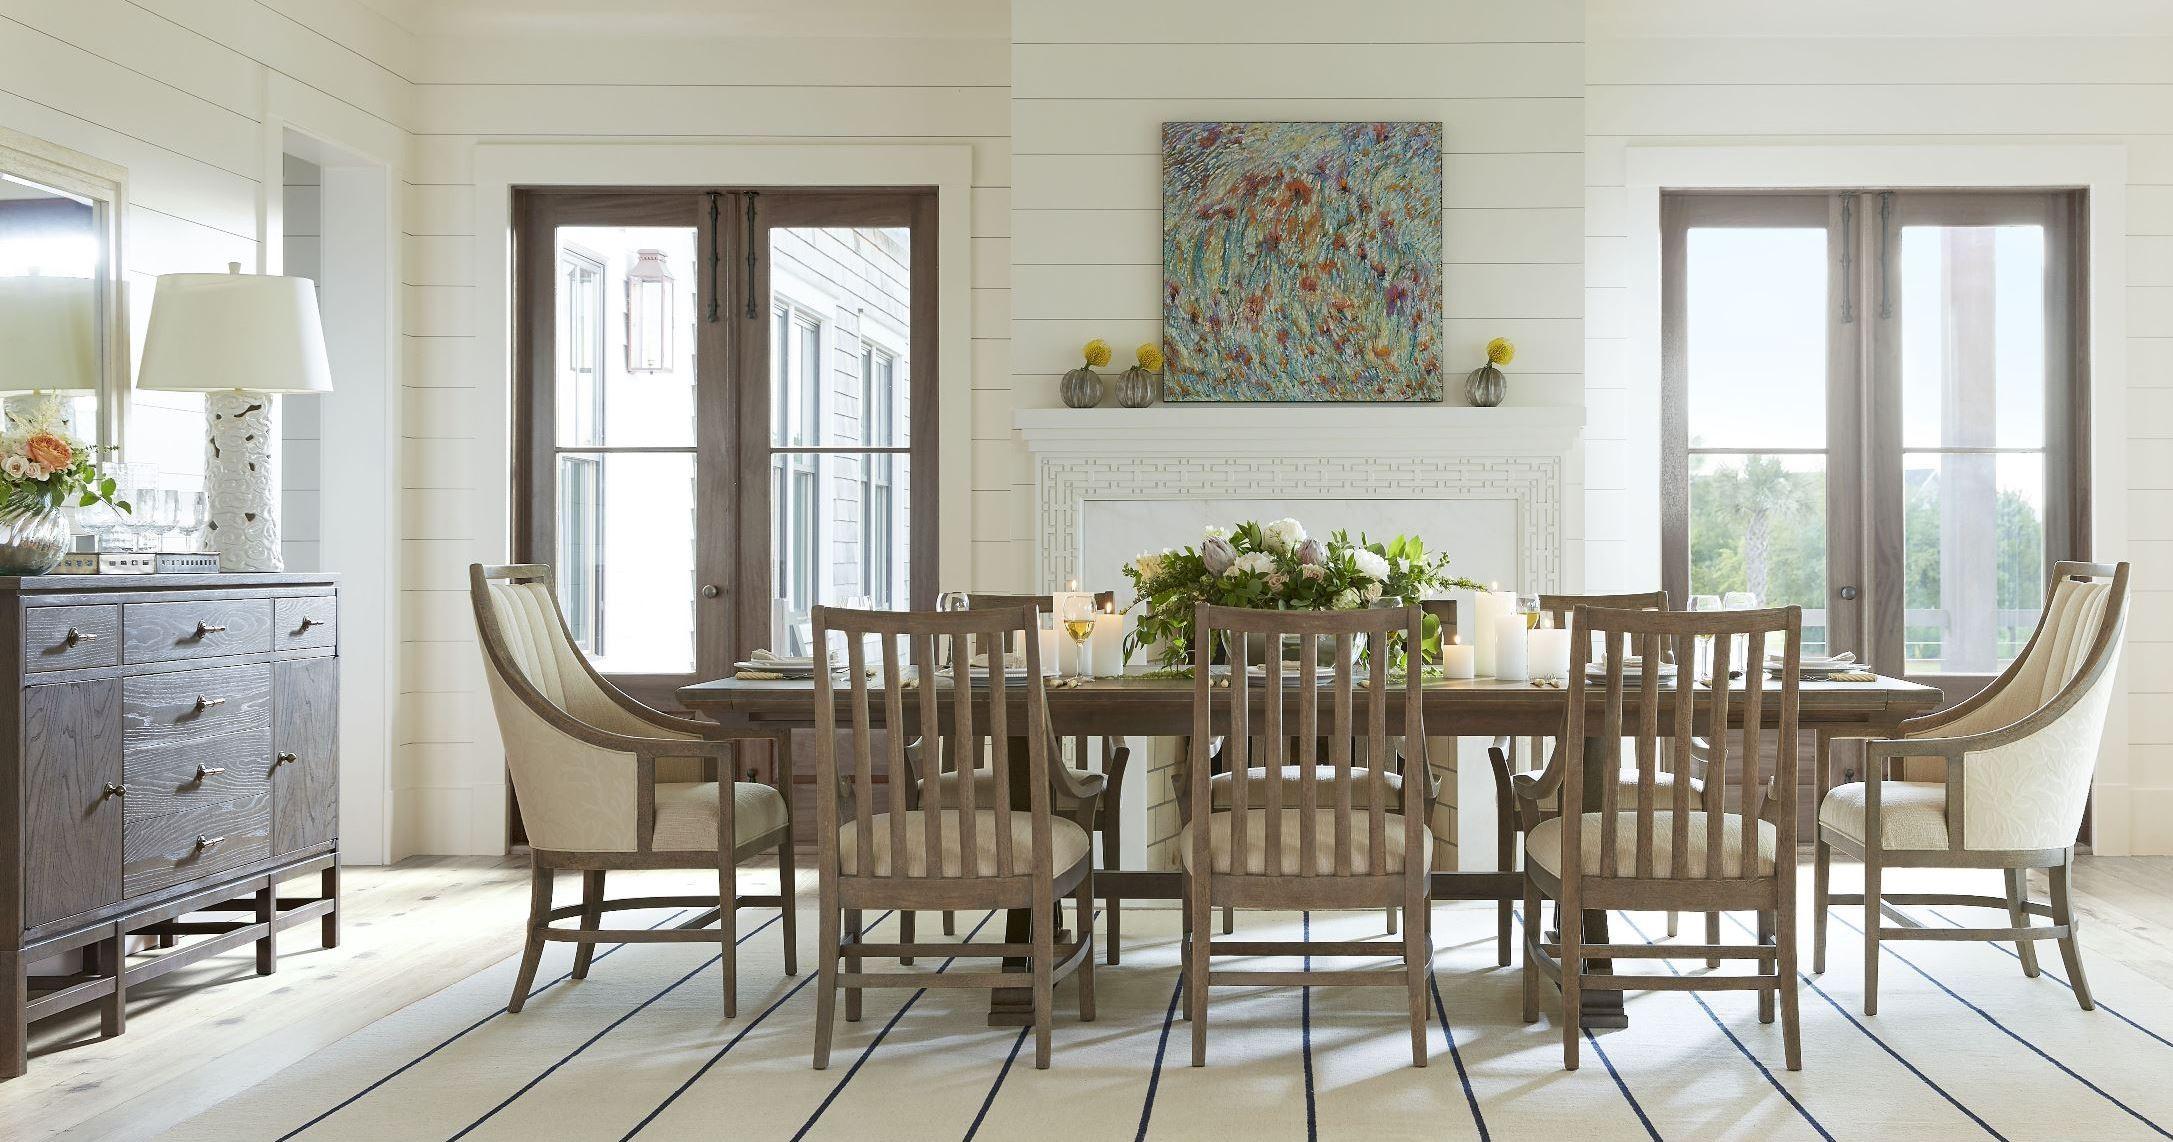 Resort Deck Shelter Bay Extendable Rectangular Dining Room ... on Living Room Deck id=62801